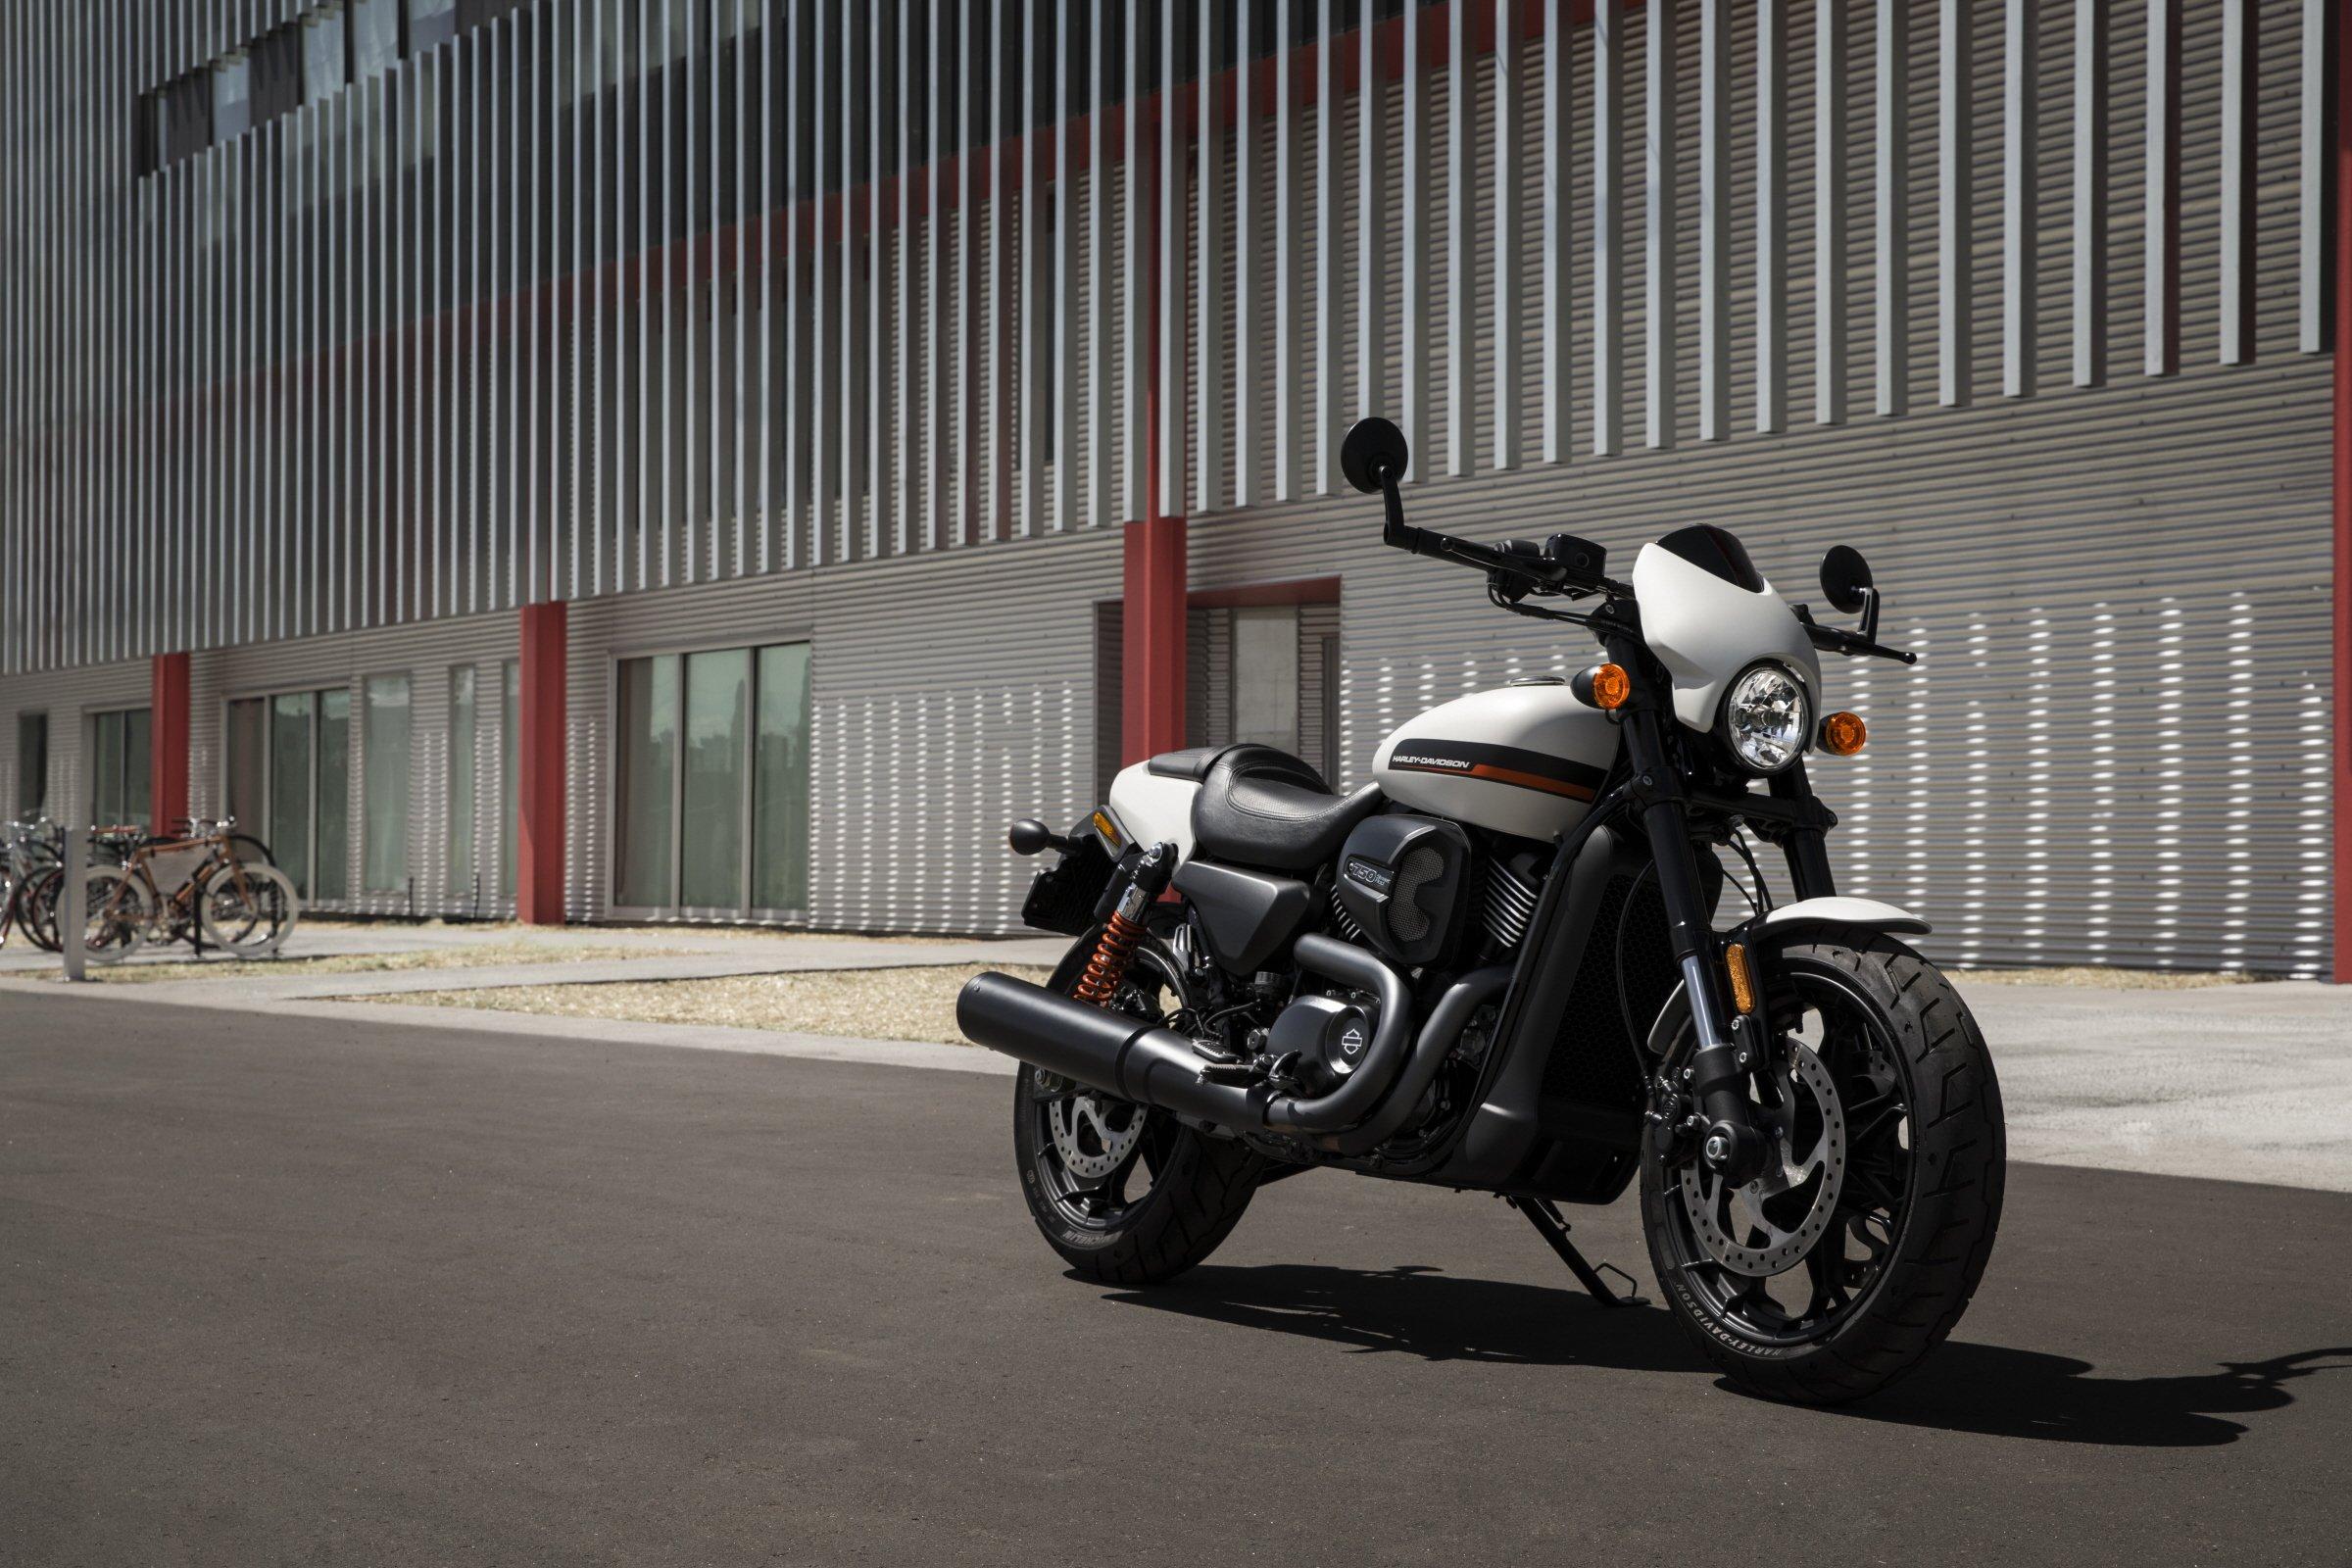 Мотоциклы Harley-Davidson дешевеют на фоне коронавируса и обвала рубля